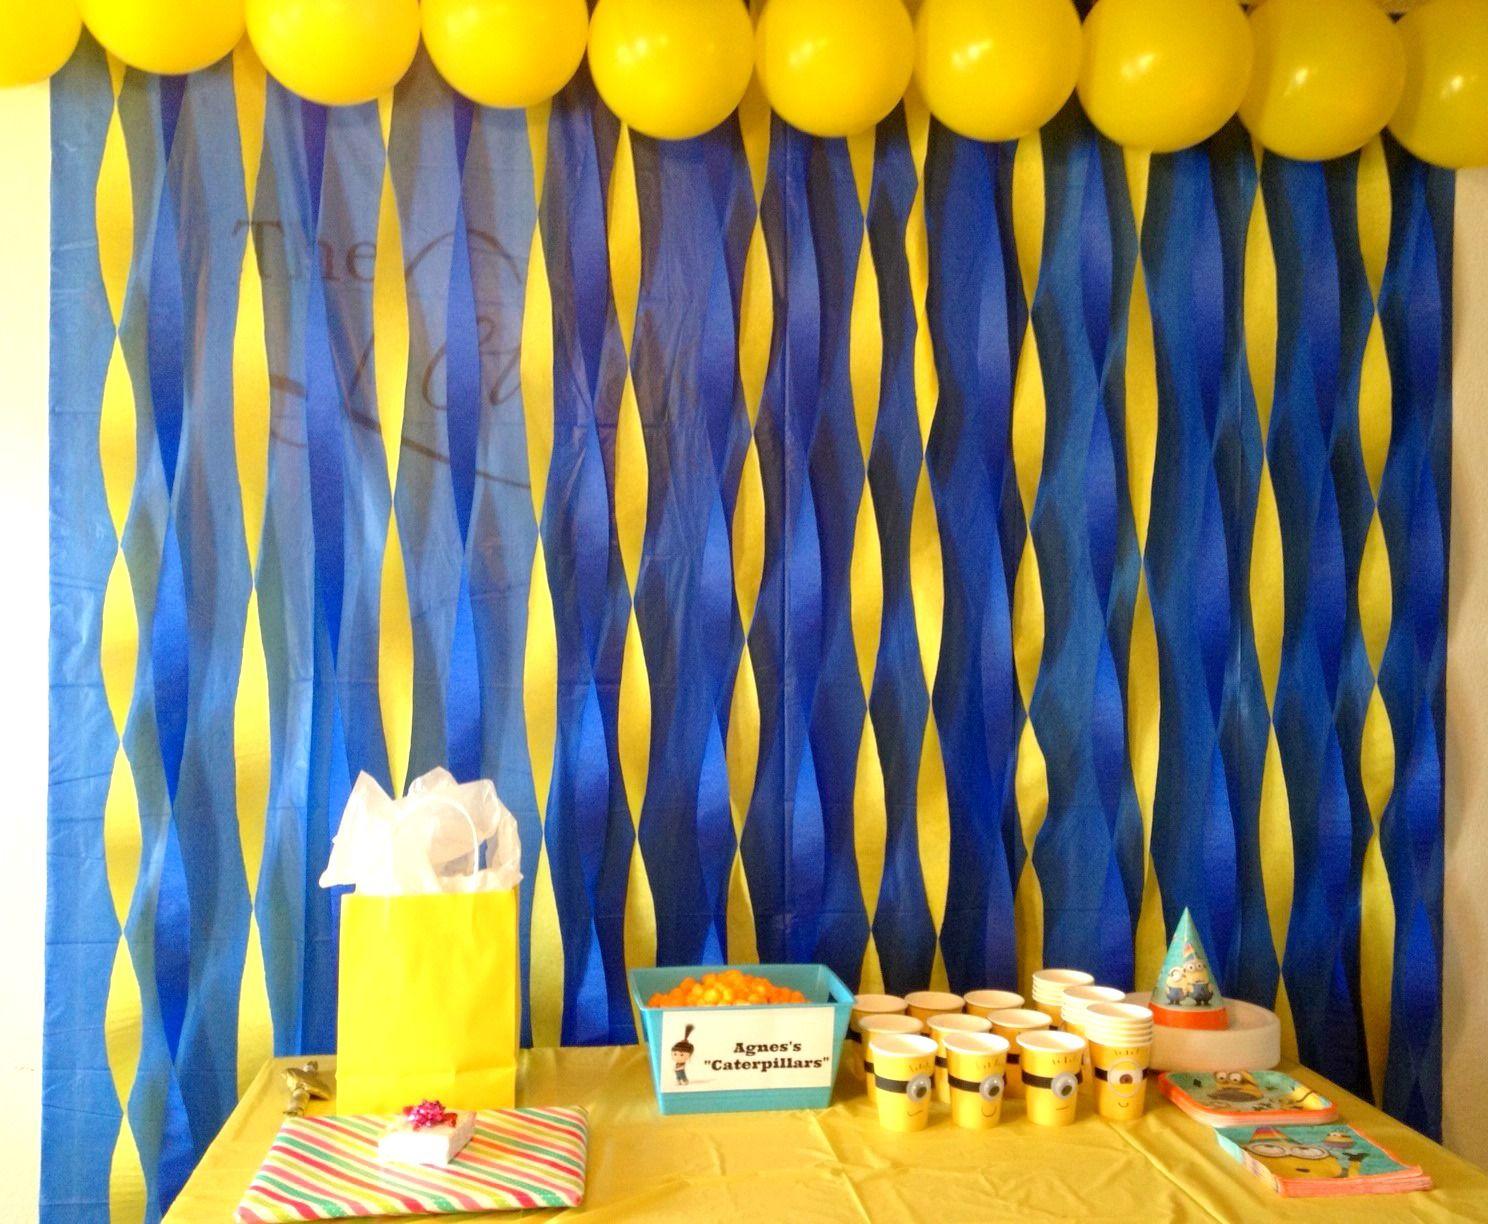 Minion Party Theme Buscar Con Google Minion Birthday Party Minion Party Minion Birthday